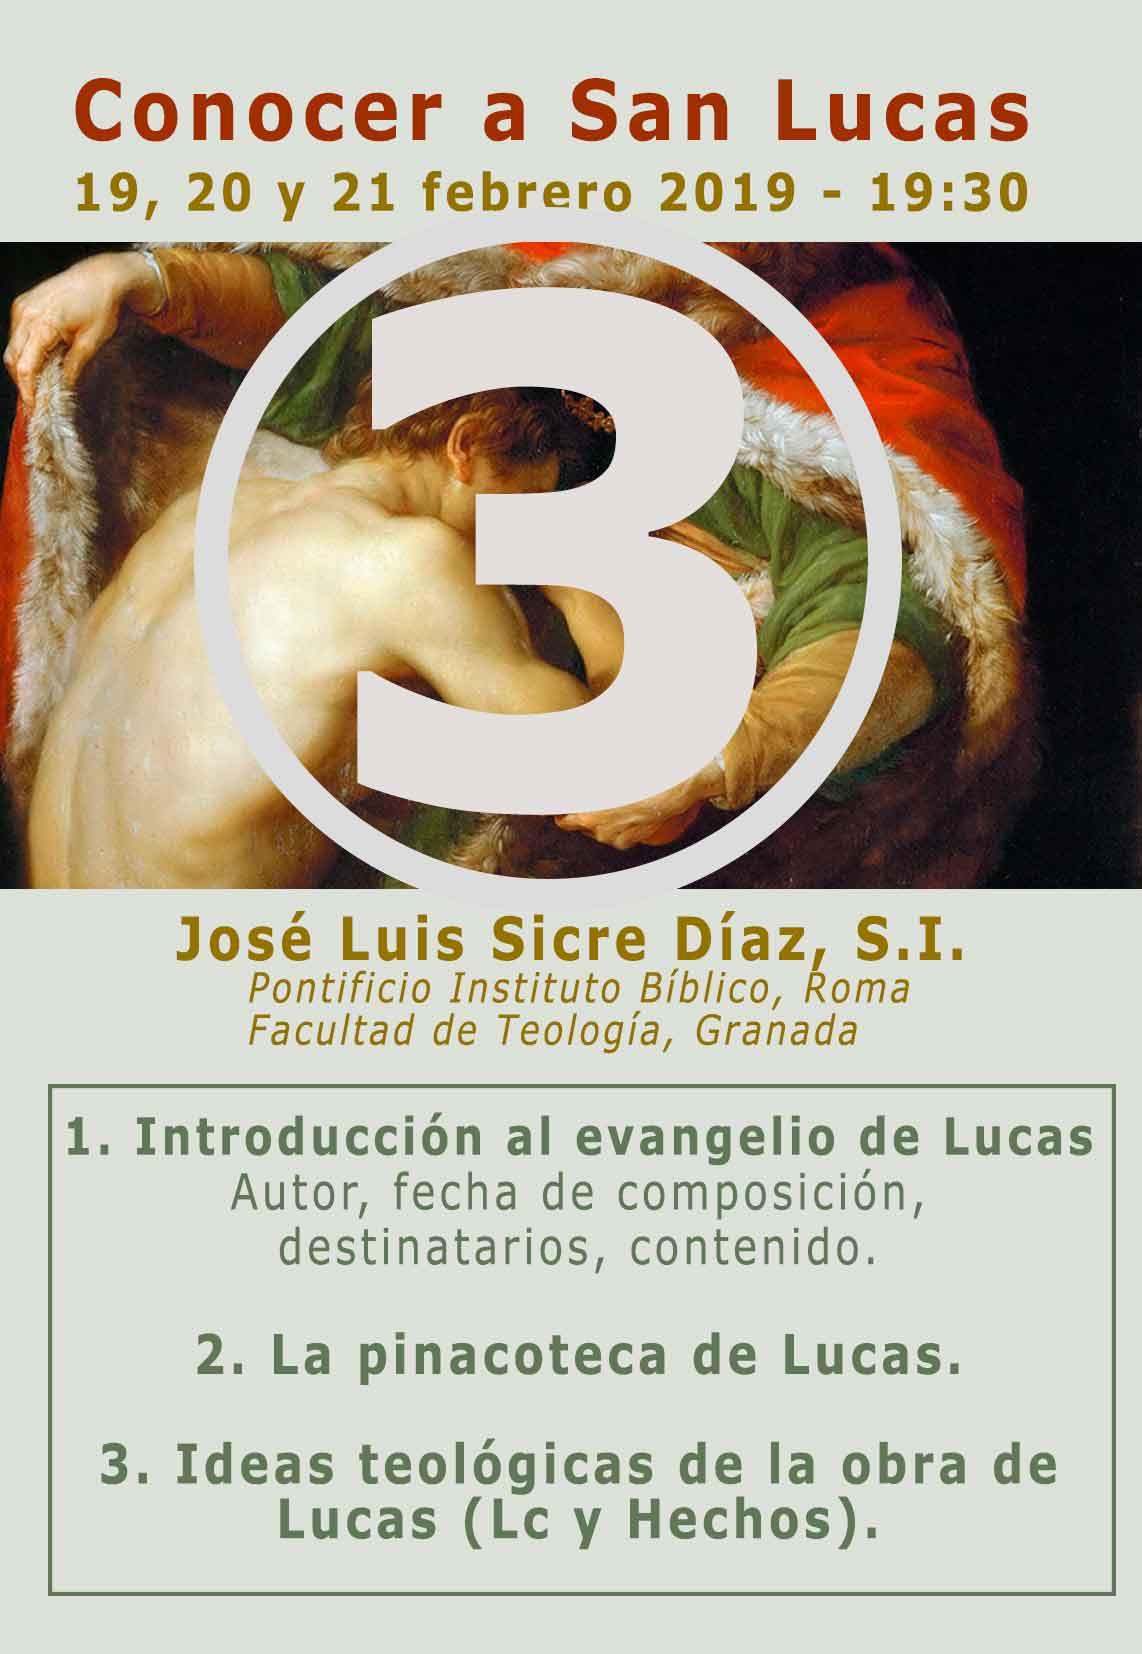 JOSE LUIS SICRE, S.I. PARTE 3